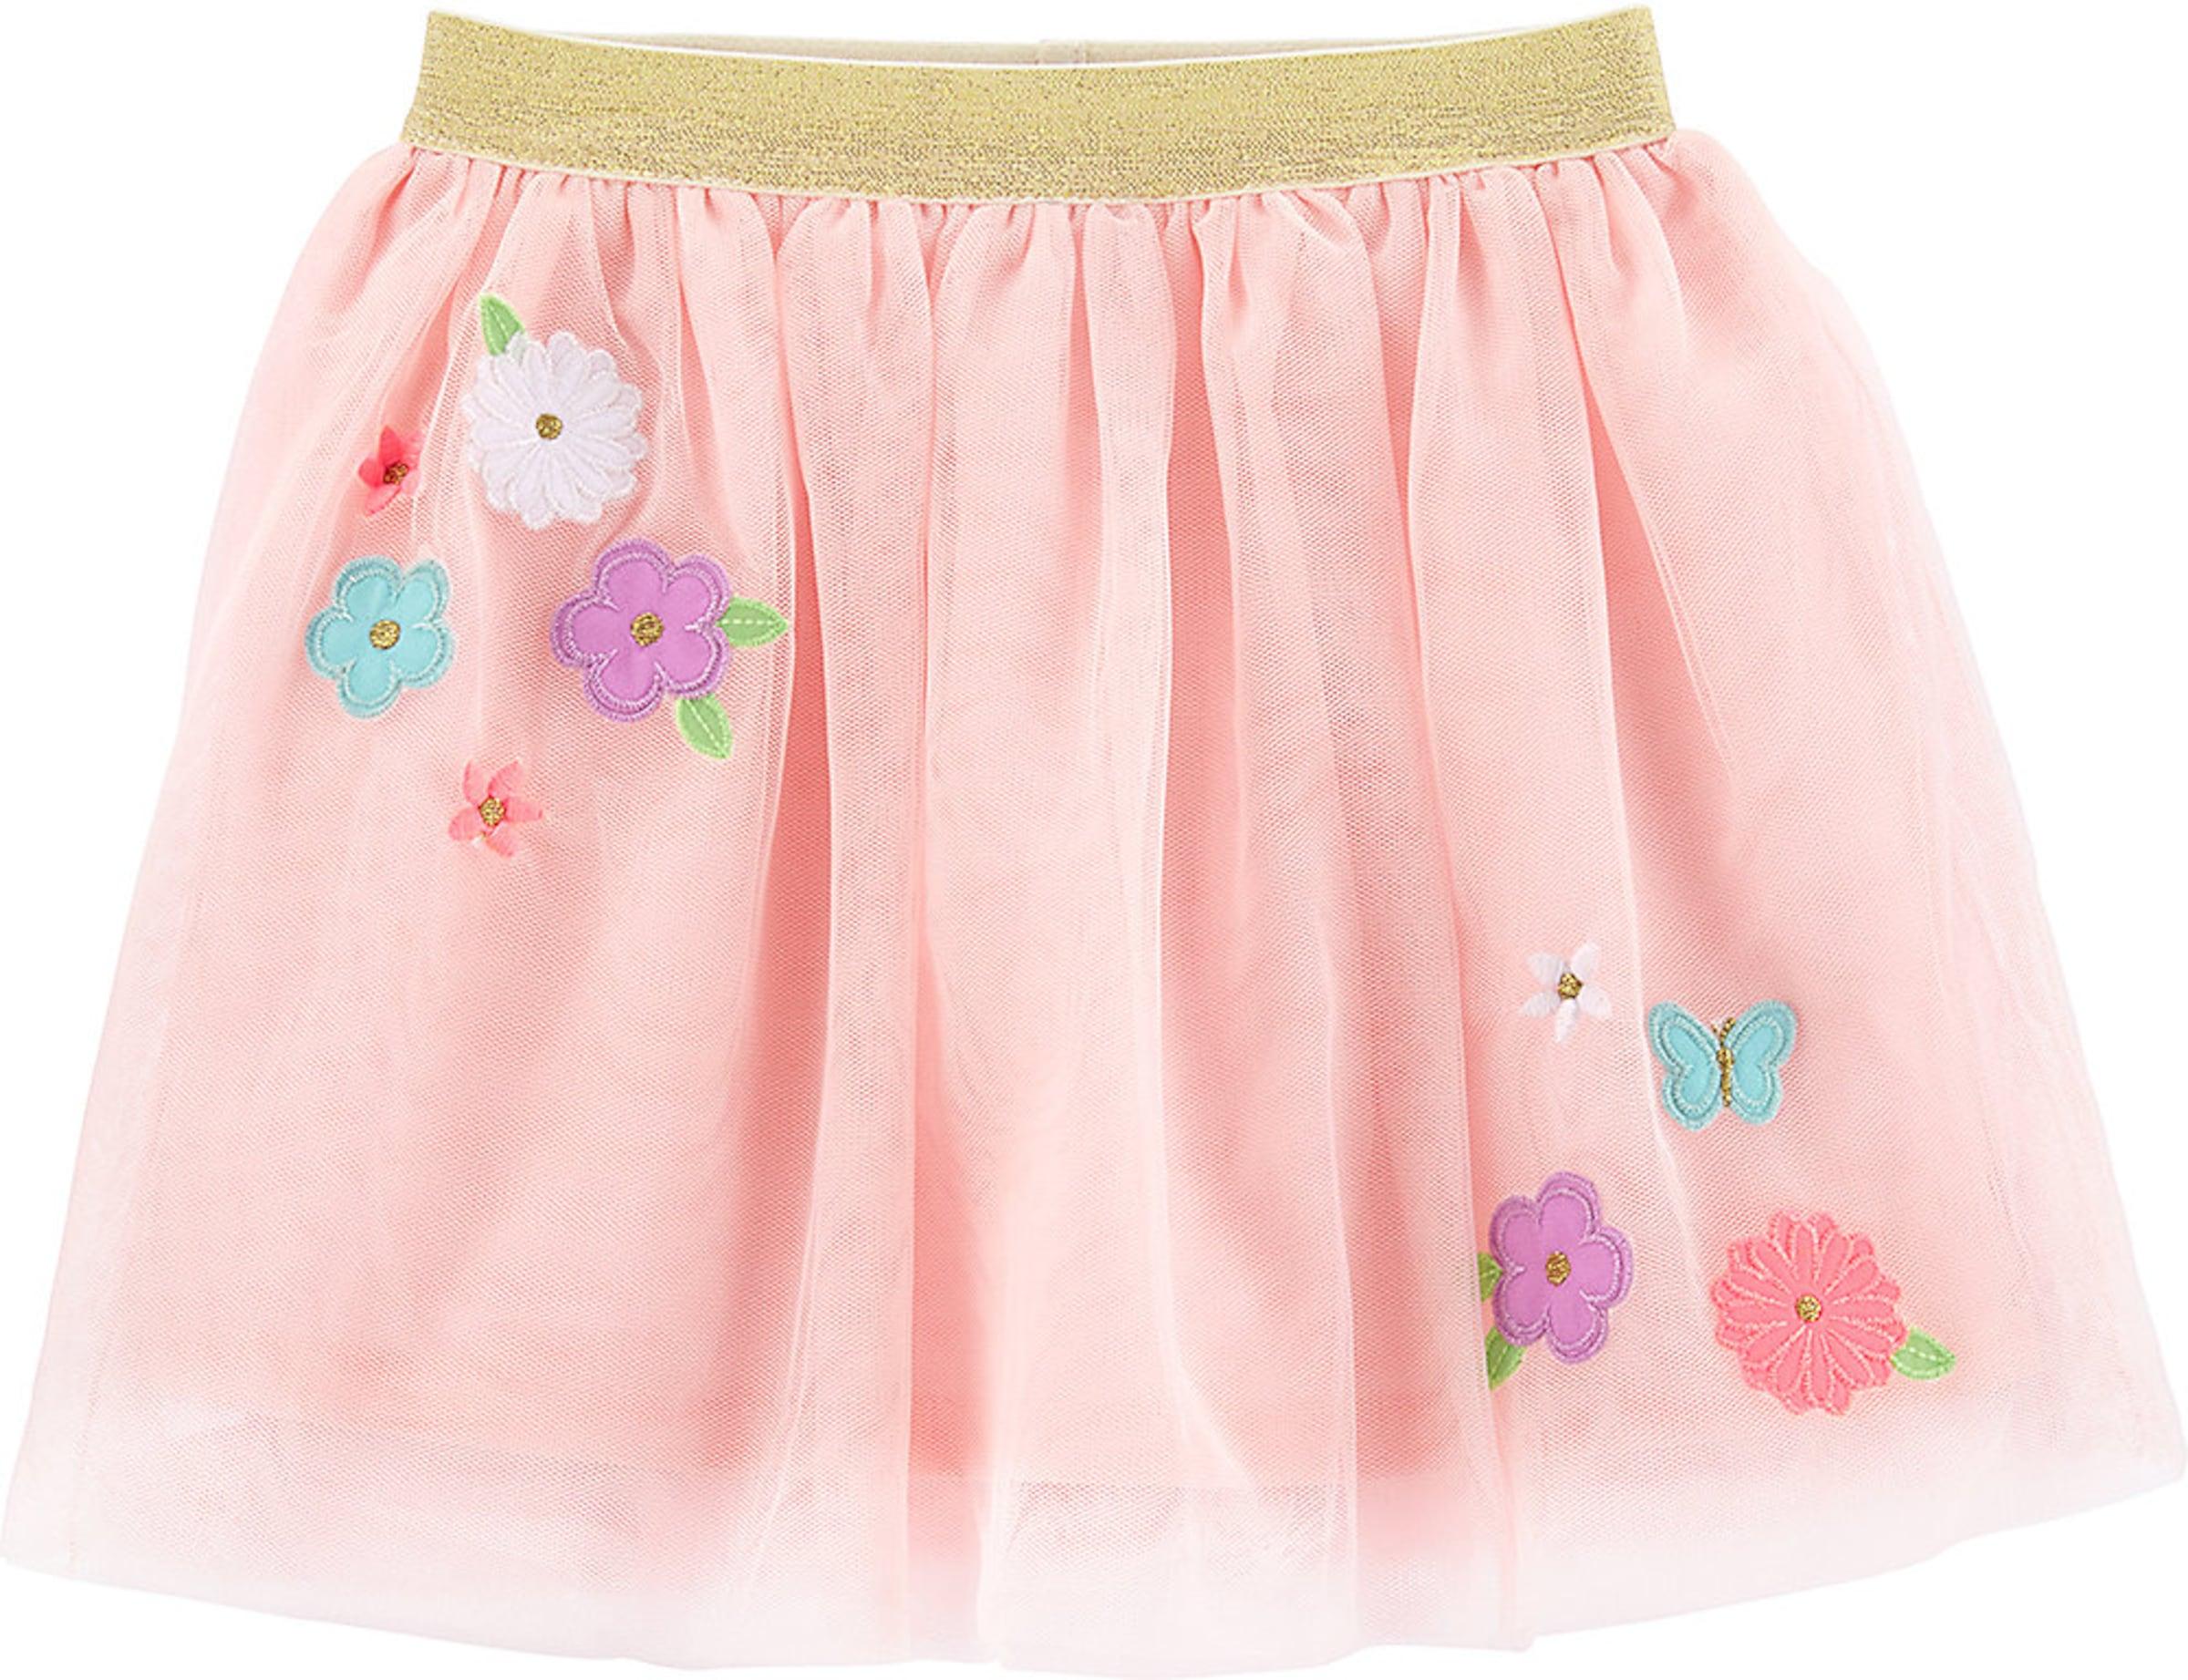 Kinder,  Mädchen,  Kinder Carter's Tüllrock bunt,  mehrfarbig, rosa, schwarz | 00192135616161